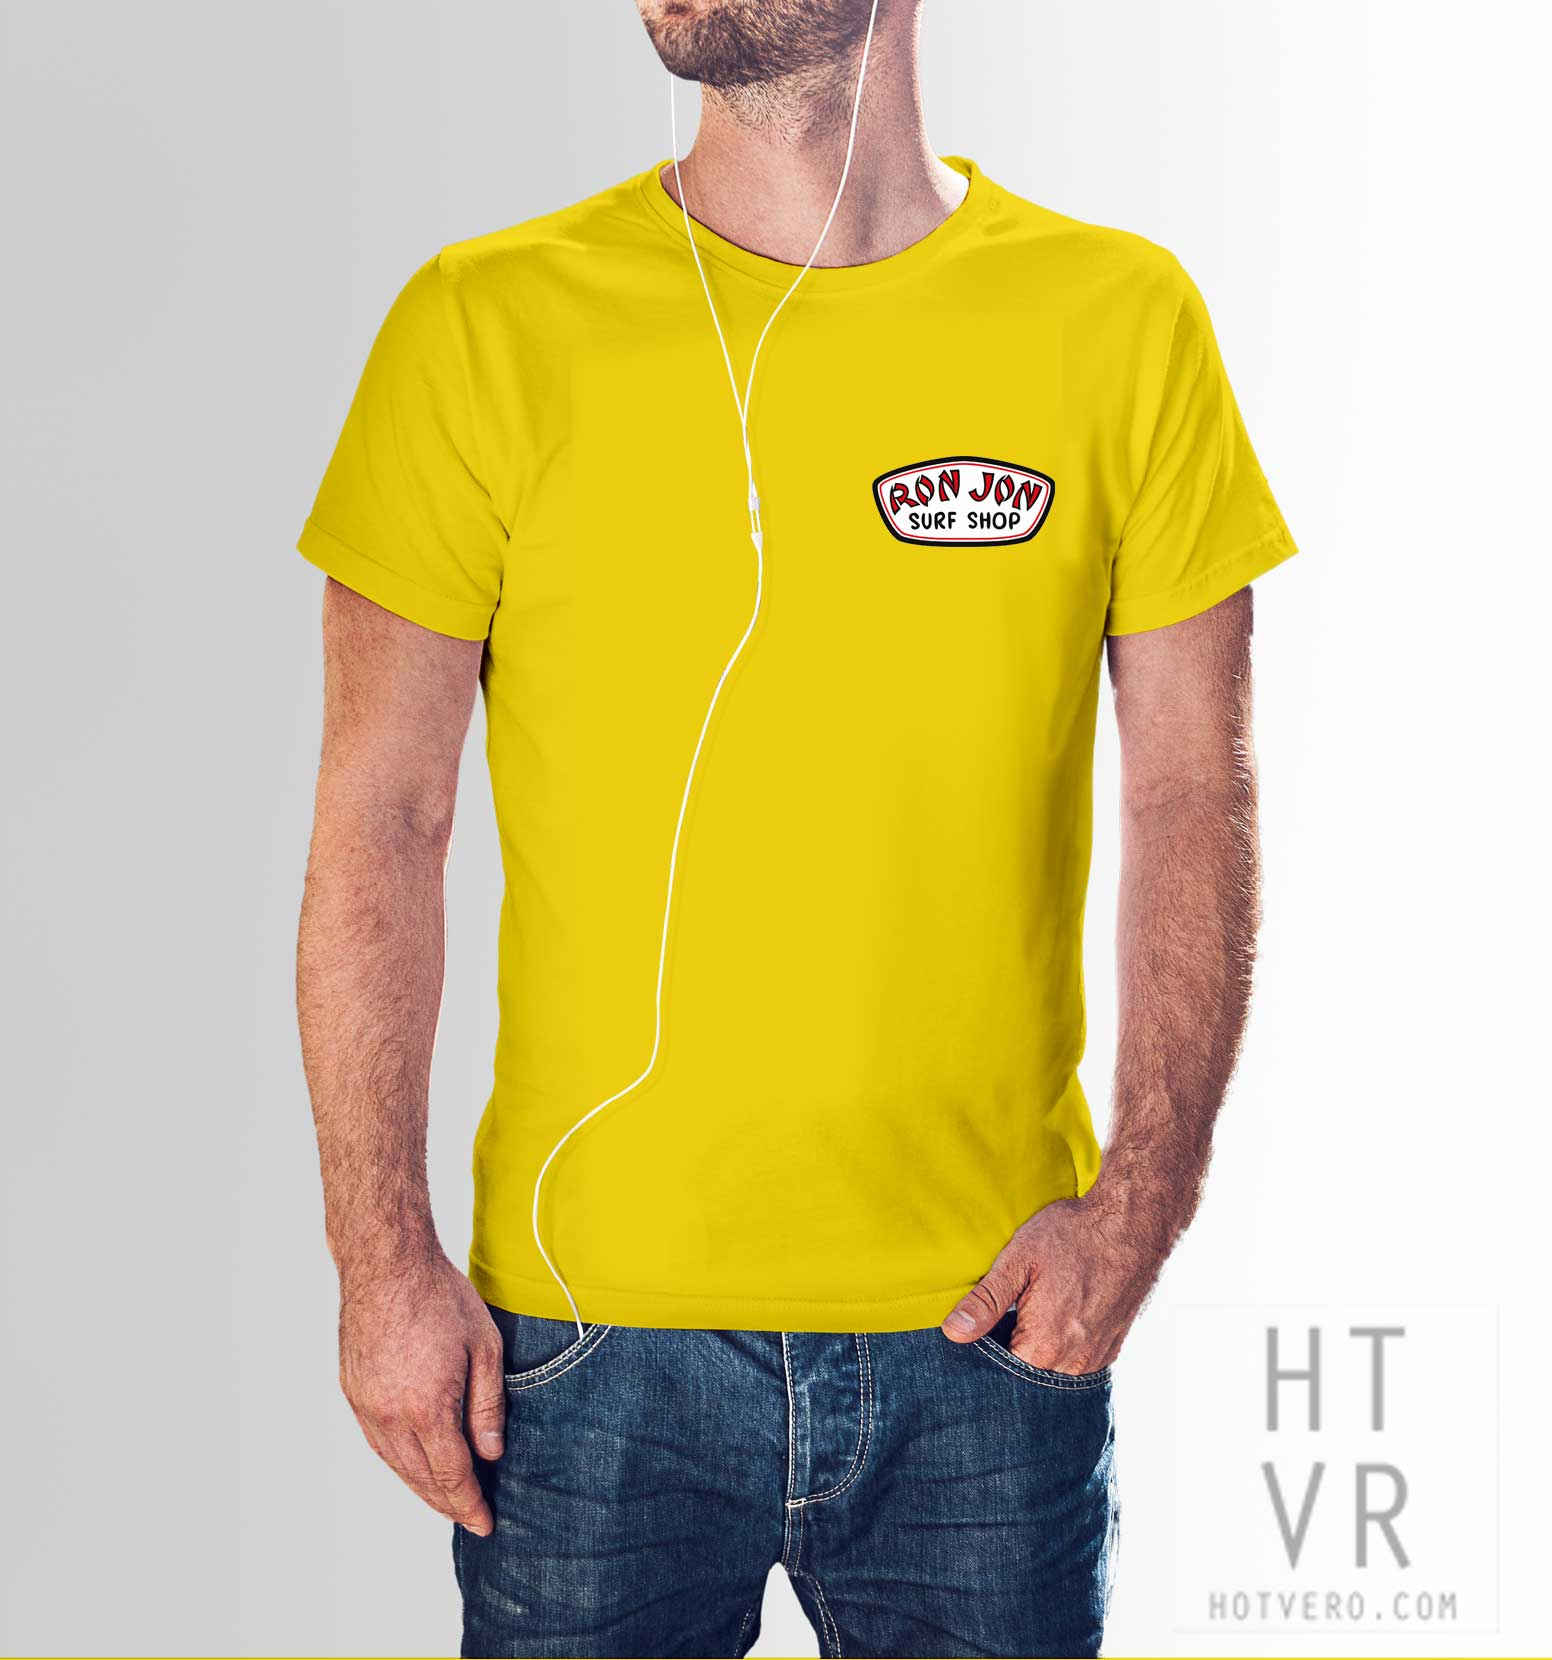 d8f470c92f2b Ron Jon Surf Shop Vintage Summer T Shirt - HotVero